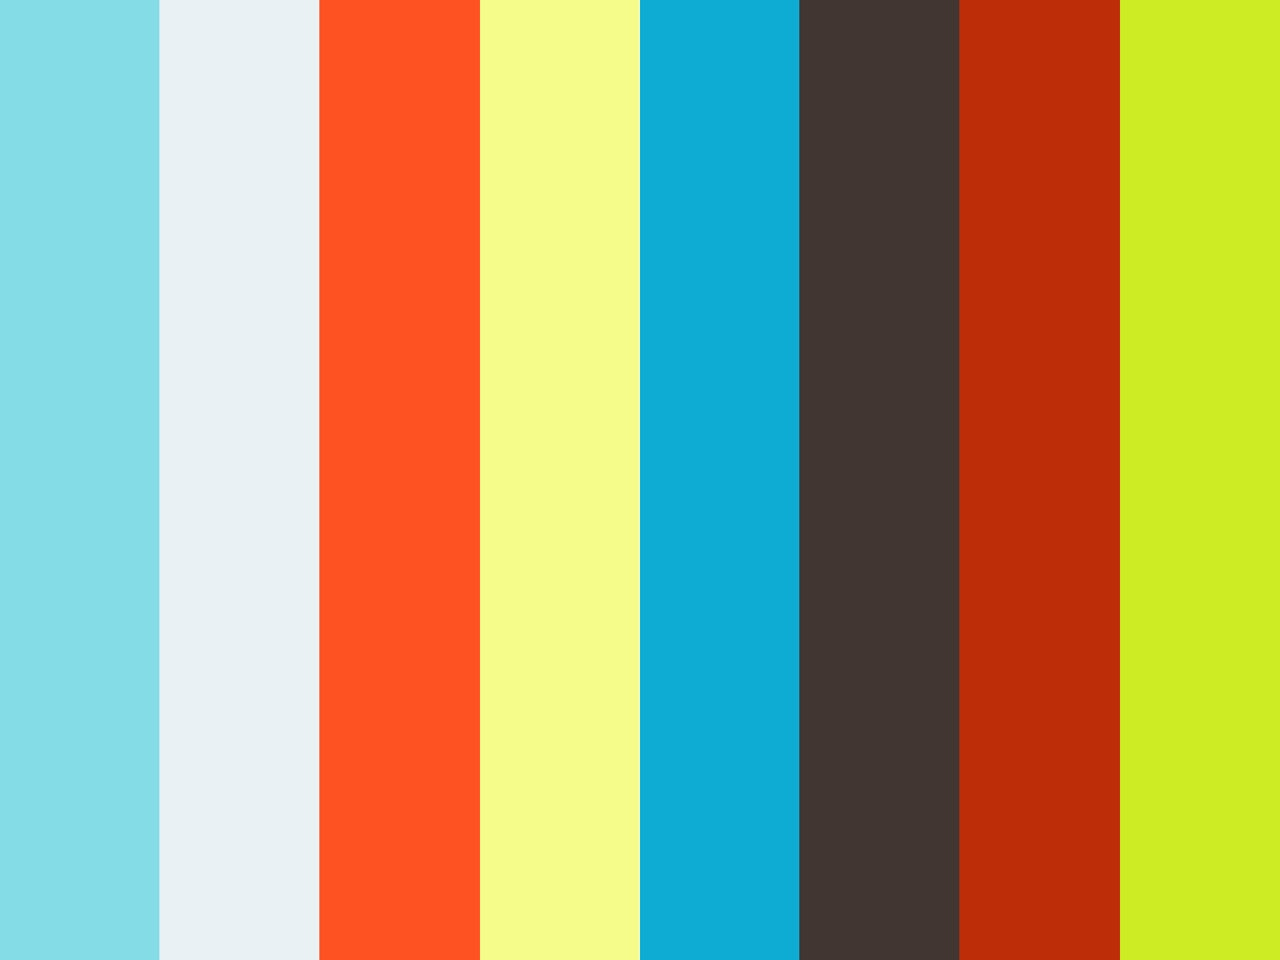 LED PRESENTS - TRAMPSLIKEUS 2015